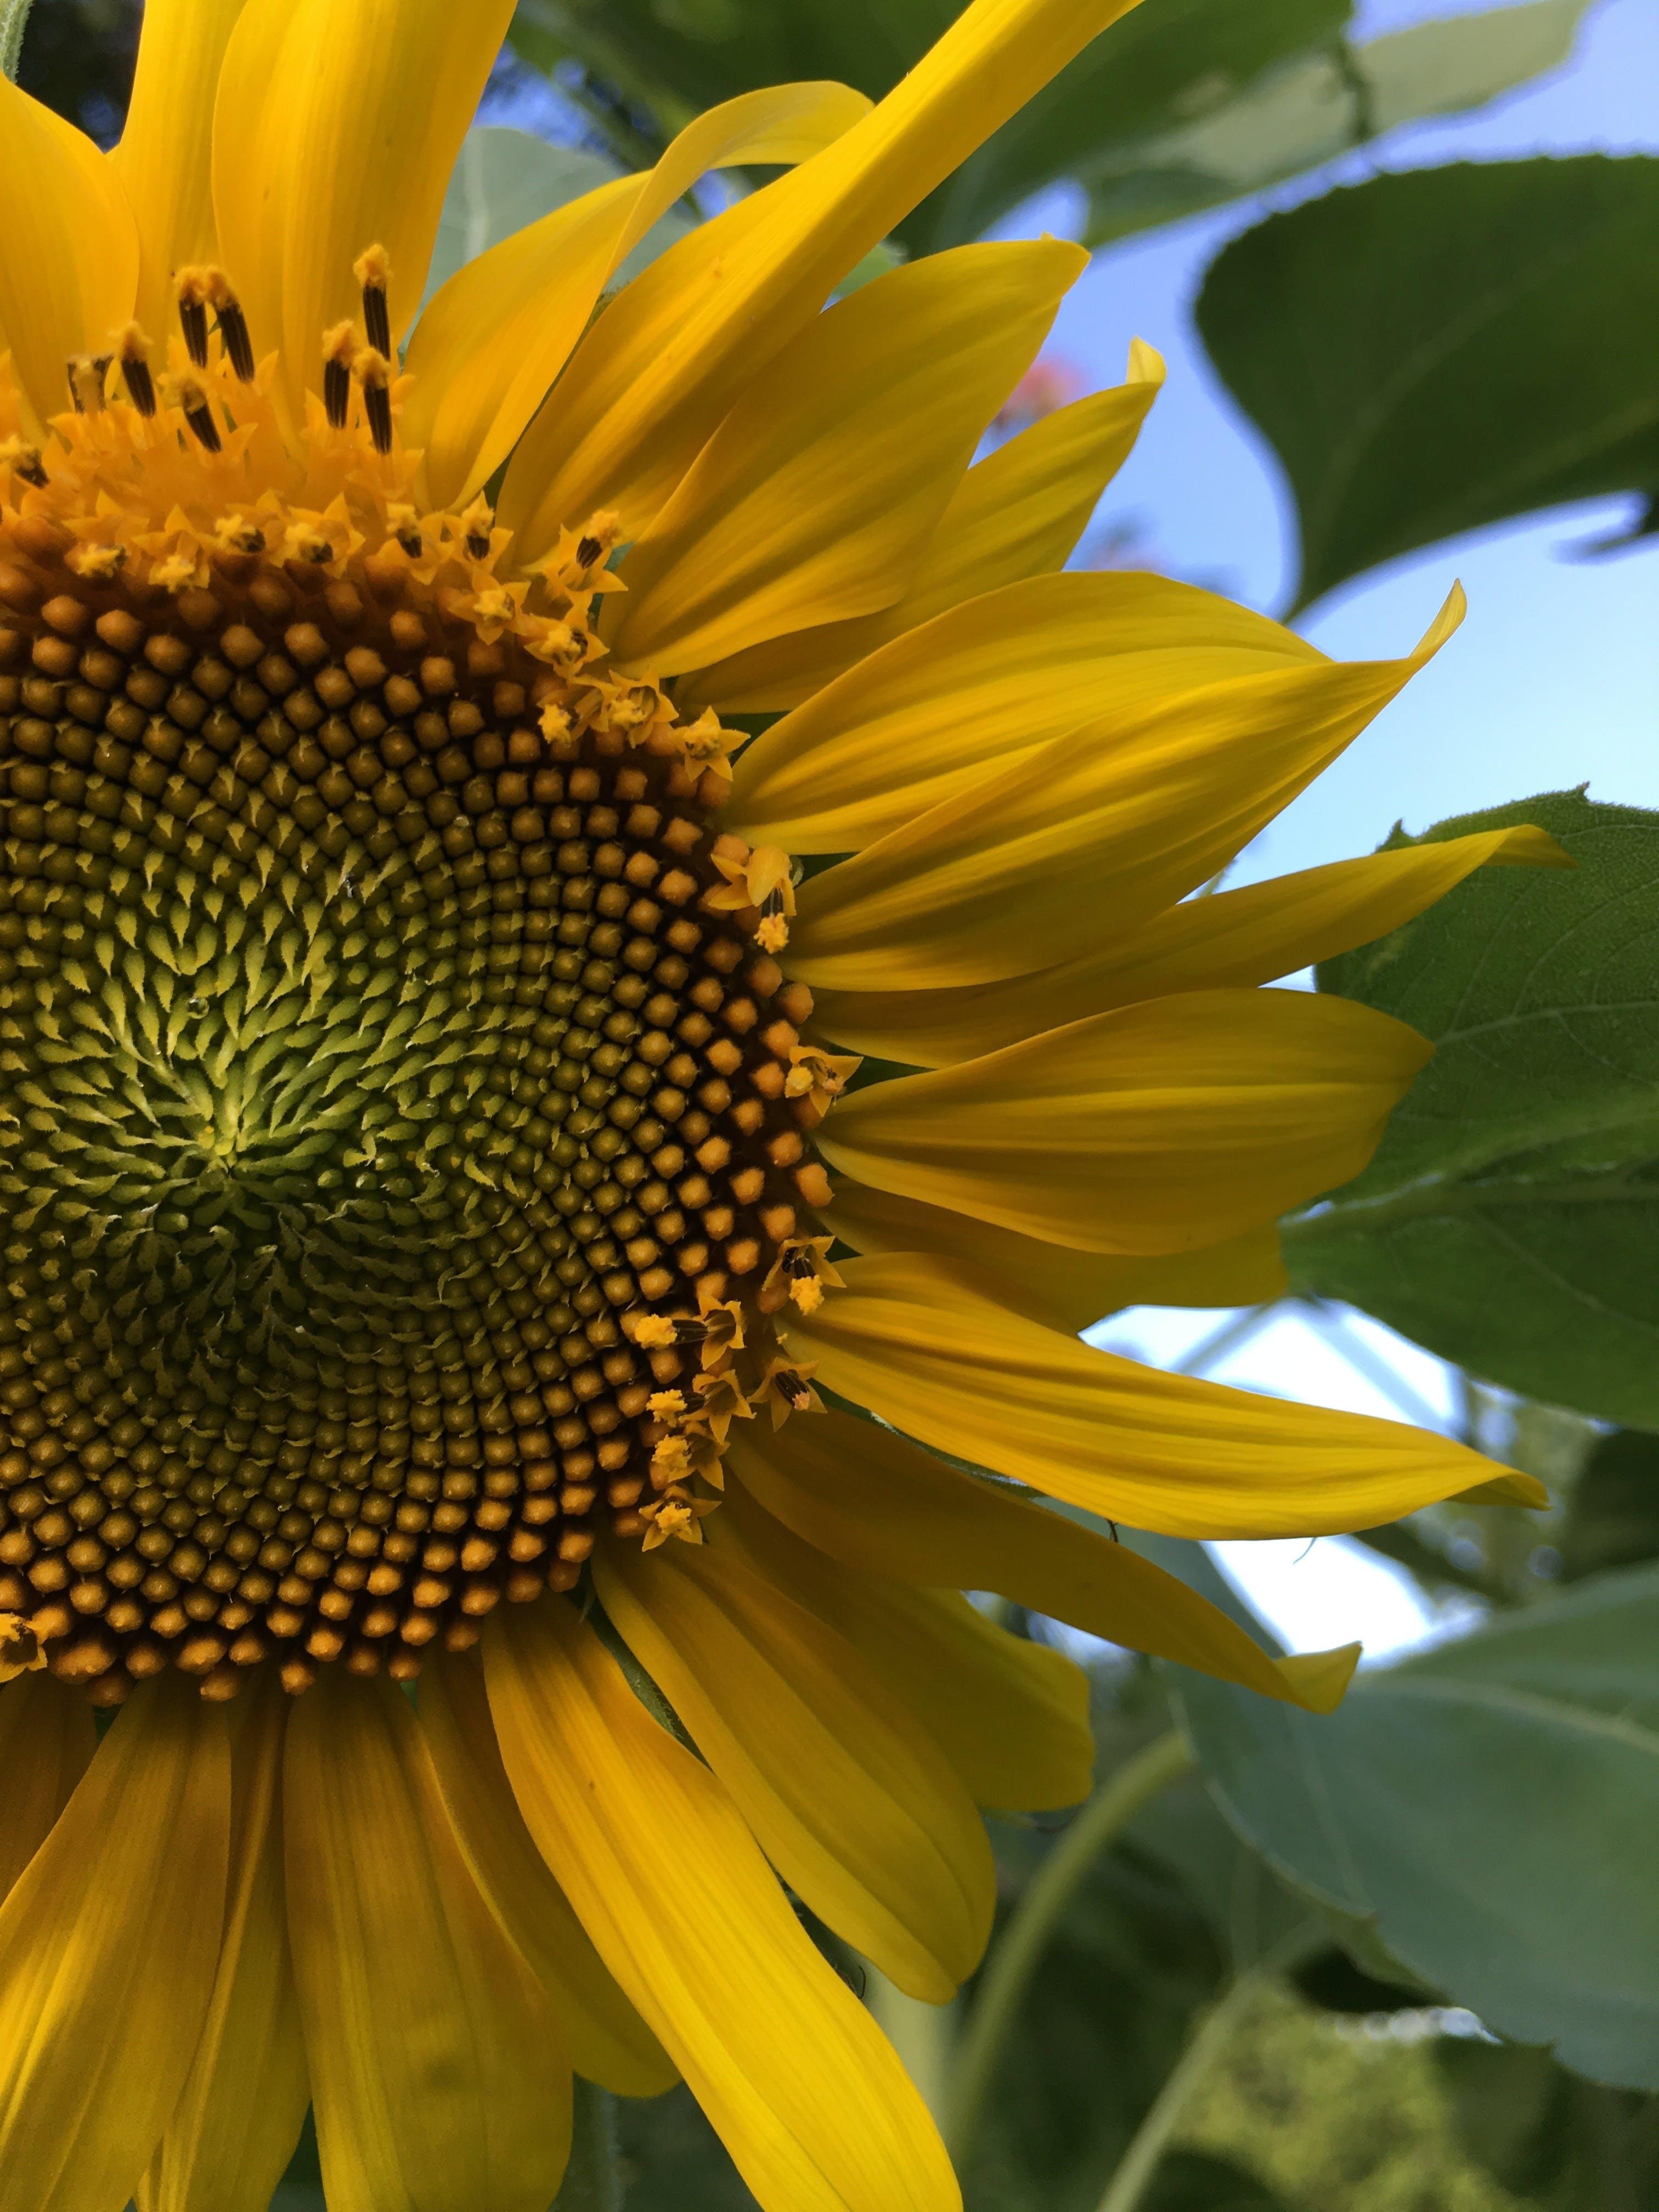 Free stock photo of summer, blue sky, sunflower, green leaves